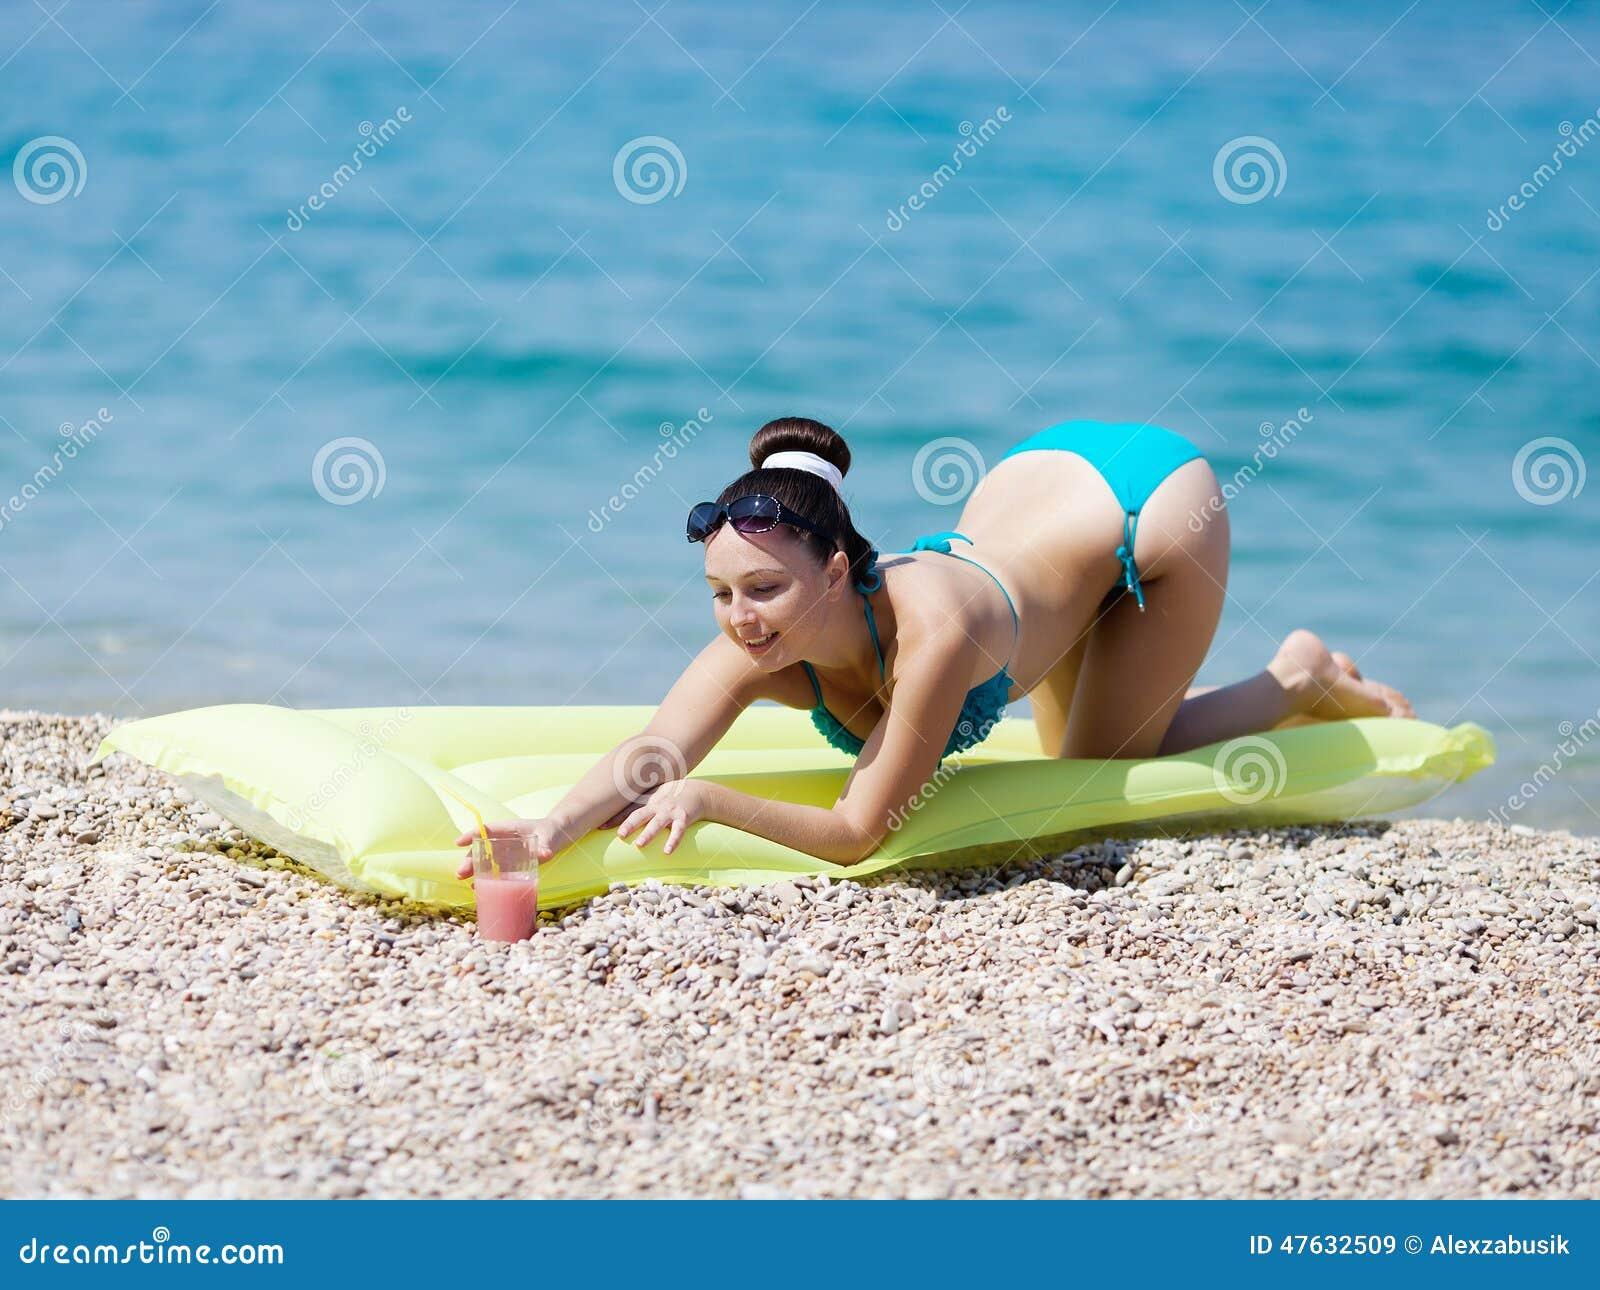 Teen κορίτσια στο γυμνό xxx πορνό βίντεο ηλιόλουστη Λεόνε